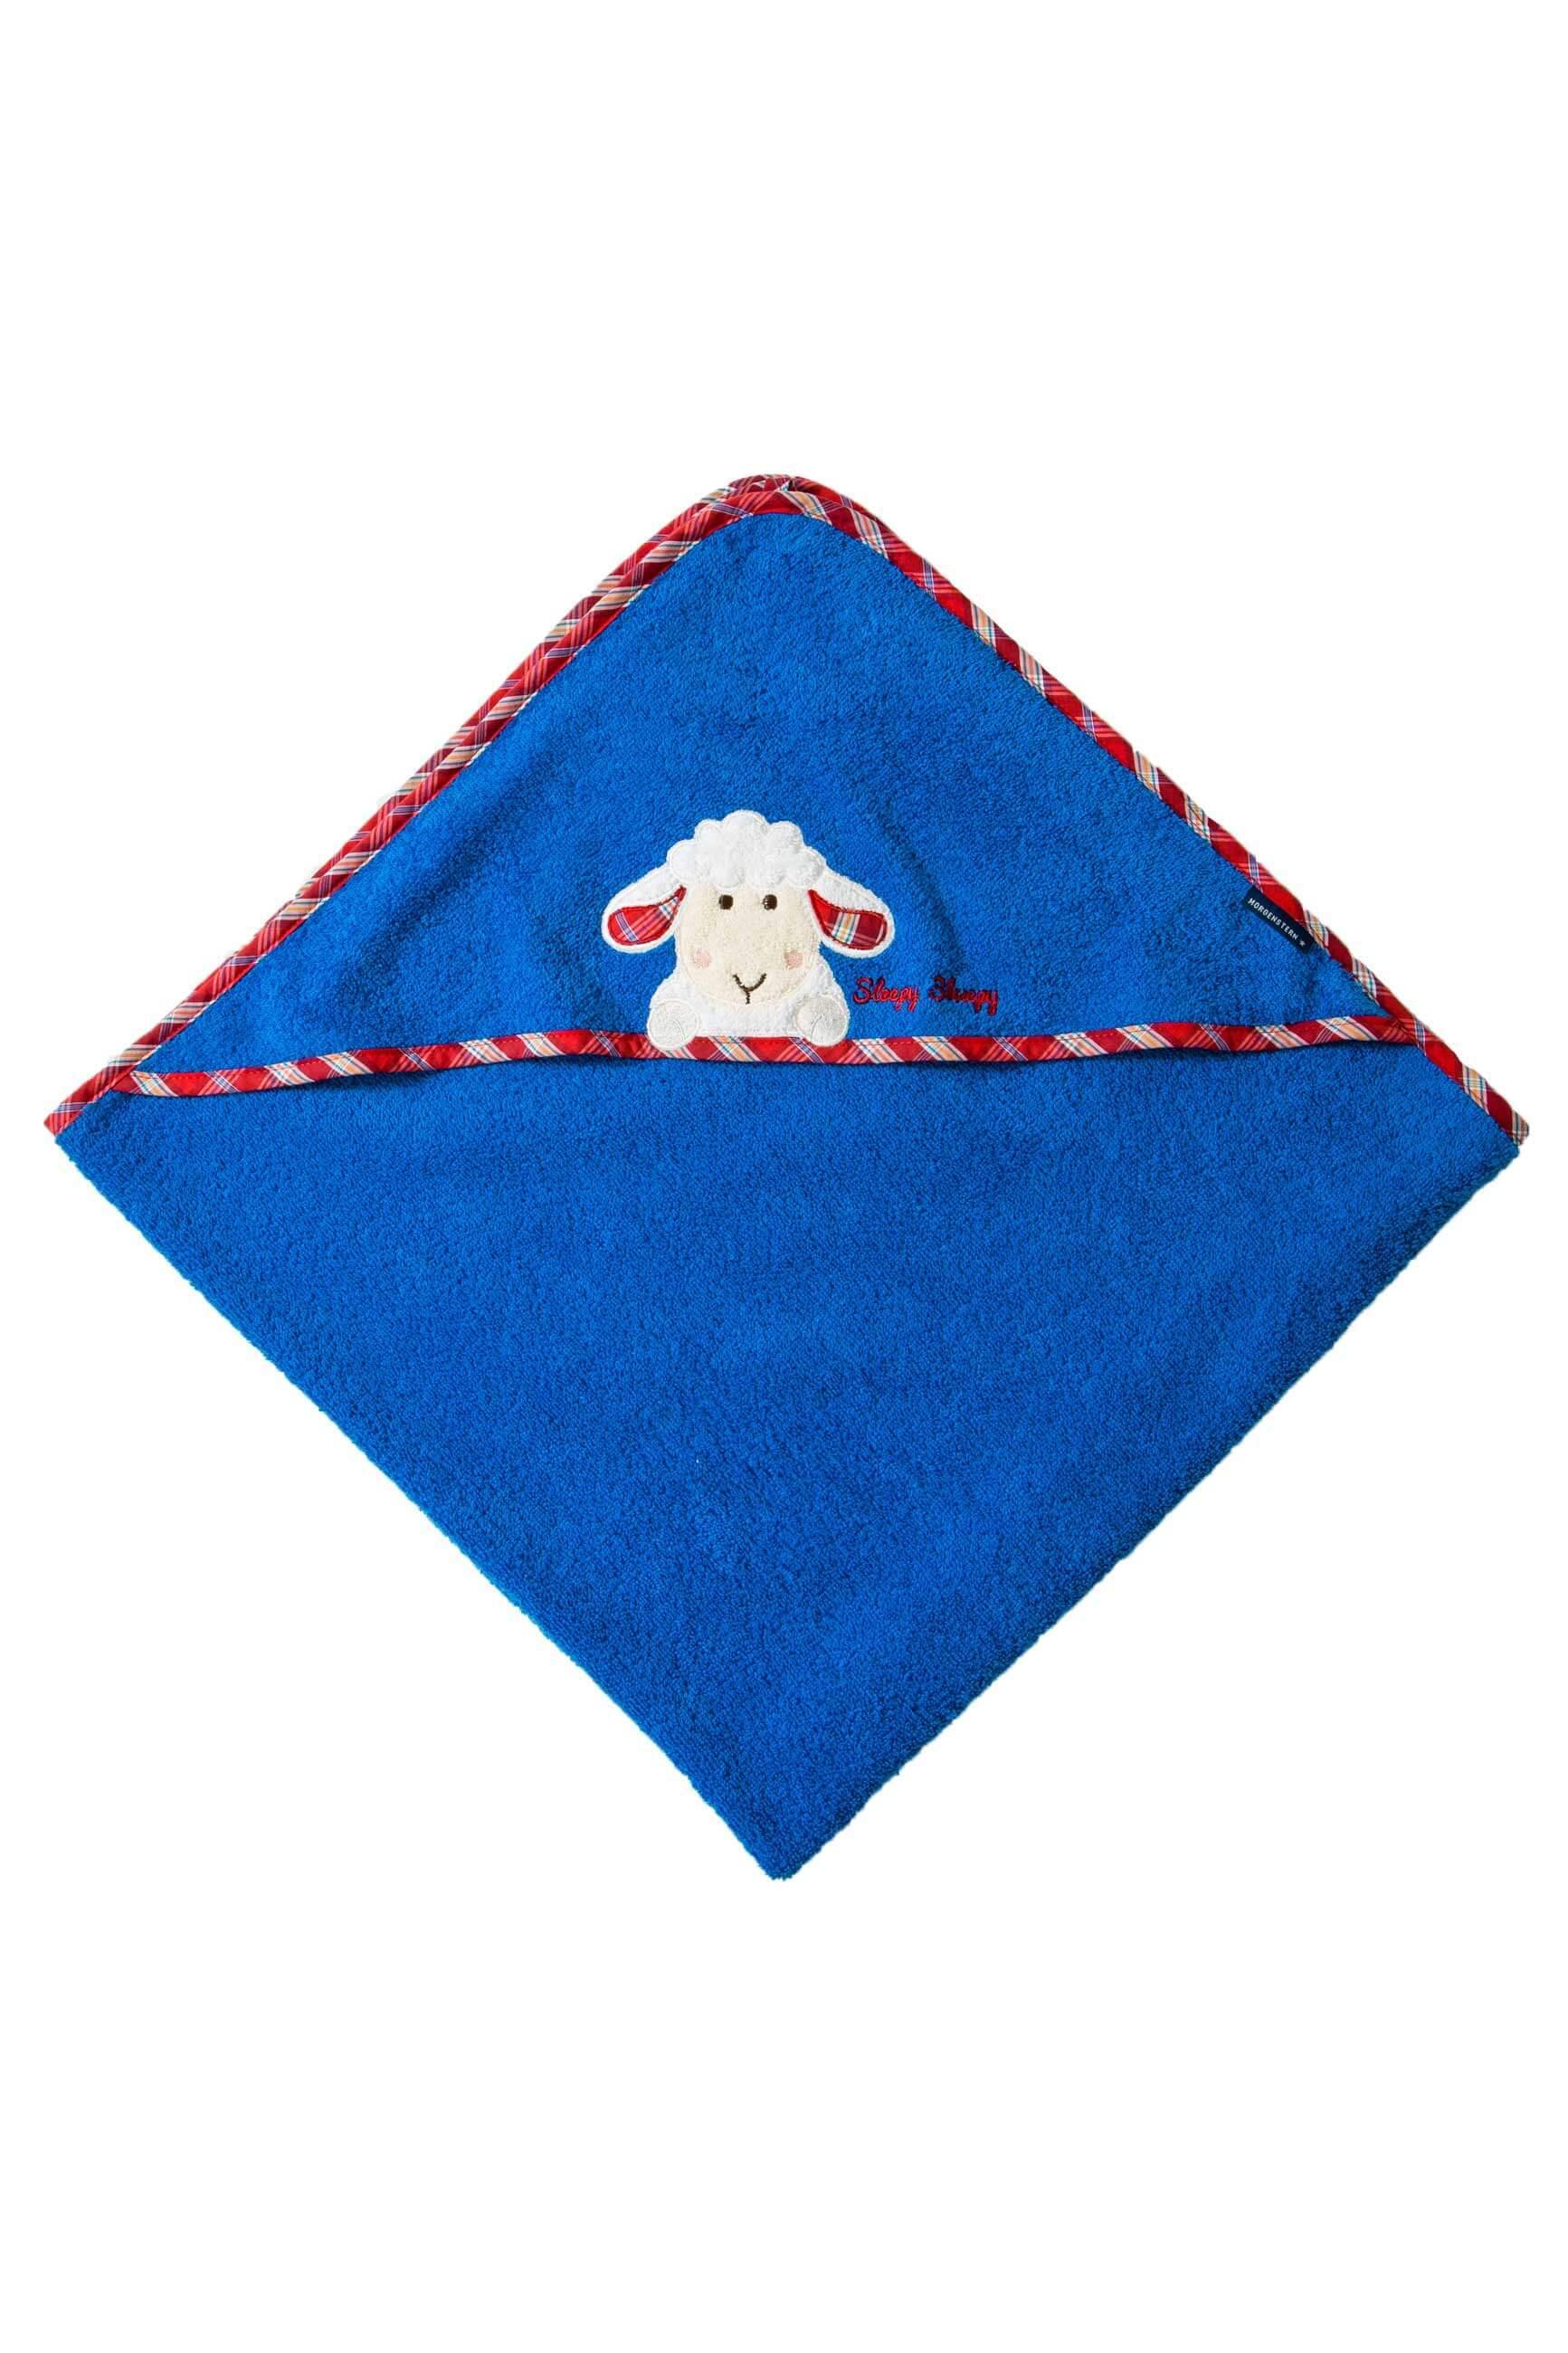 Kapuzenhandtuch Sleepy Sheepy Sweety, Morgenstern, Baumwolle, blau